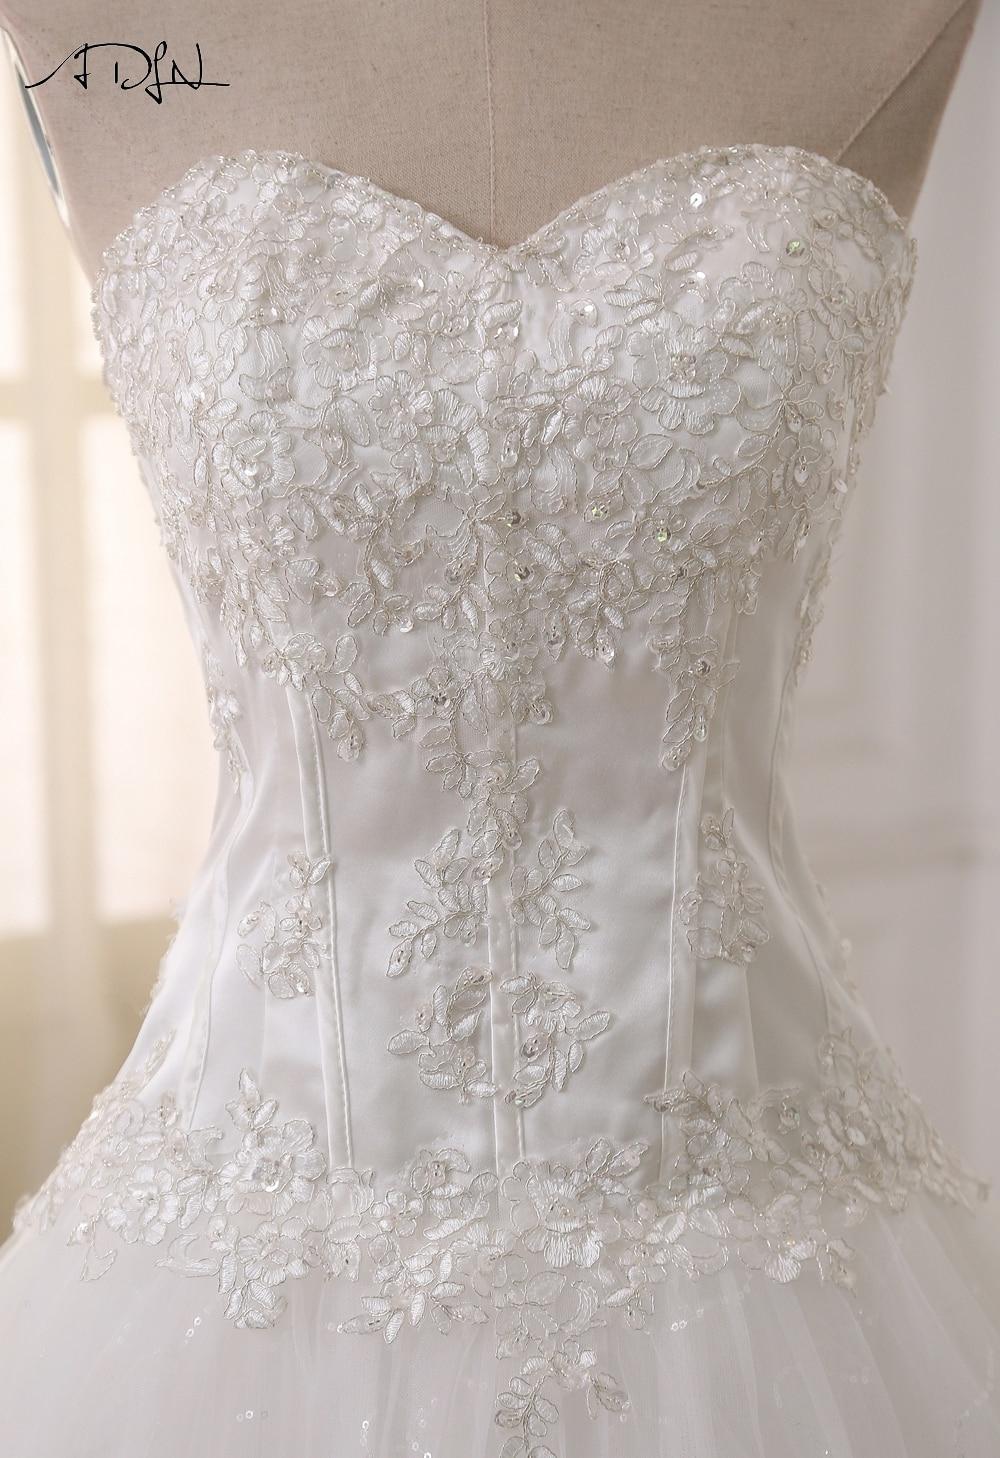 ADLN Wedding Dresses Vestidos de Novia Off the Shoulder Sweetheart Tulle Long Bride Dress Lace Up Back Plus Size In Stock 8